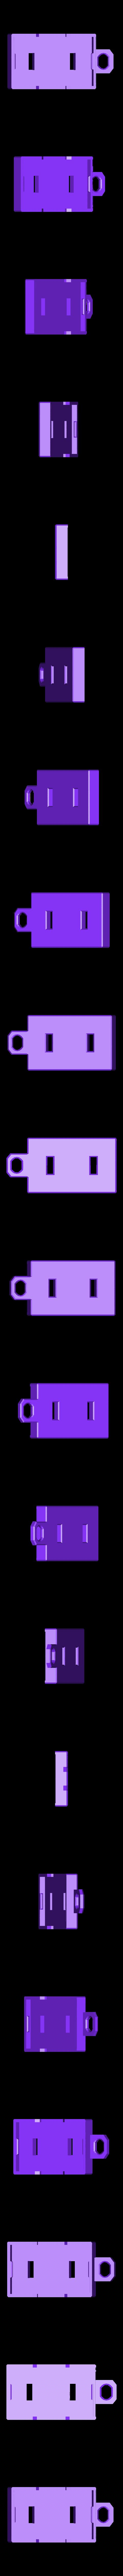 SmallToys-TrainBodyWagonFreight.stl Download STL file SmallToys - Starter Pack • 3D printer model, Wabby